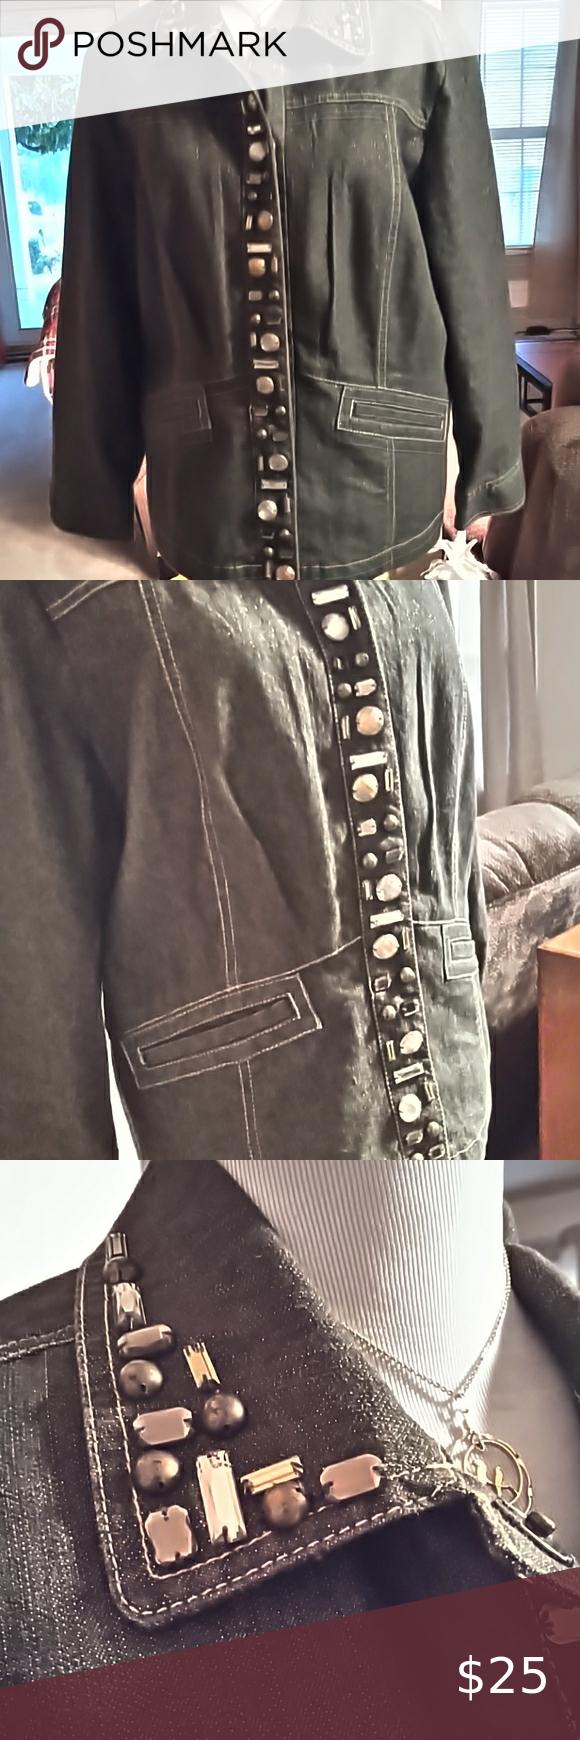 Ruby Rd Stretch Jean Jacket Gray Gold Size 14 Embellished Denim Jacket Light Wash Denim Jacket Lightweight Denim Jacket [ 1740 x 580 Pixel ]